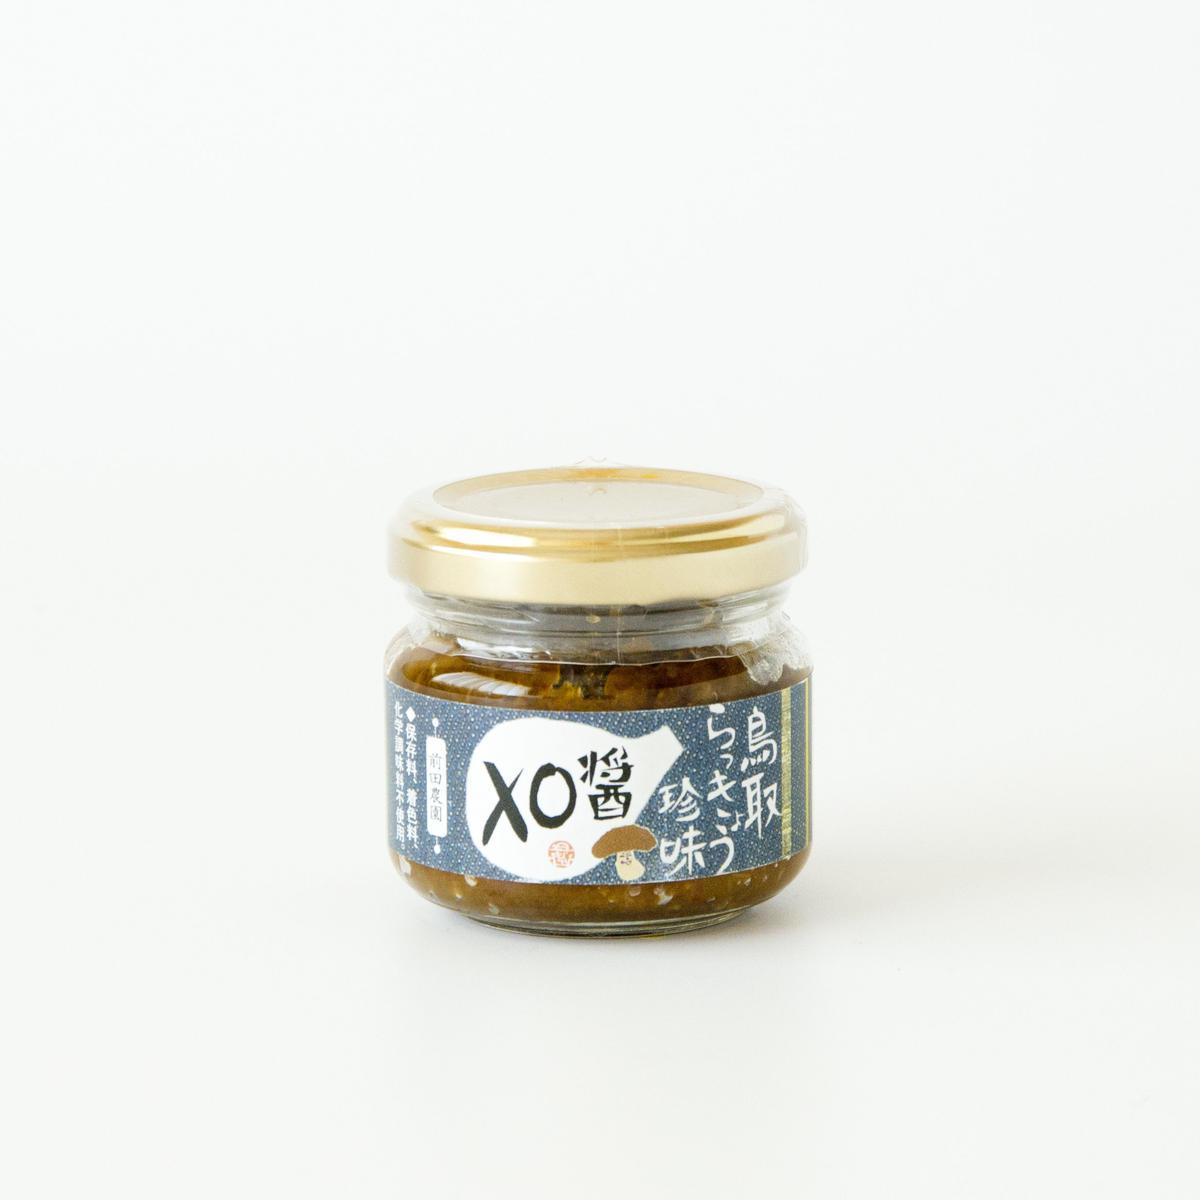 ng-non-bindable>鳥取らっきょう珍味 XO醤 (珍味・ご飯のお友) | 前田農園オンラインストア